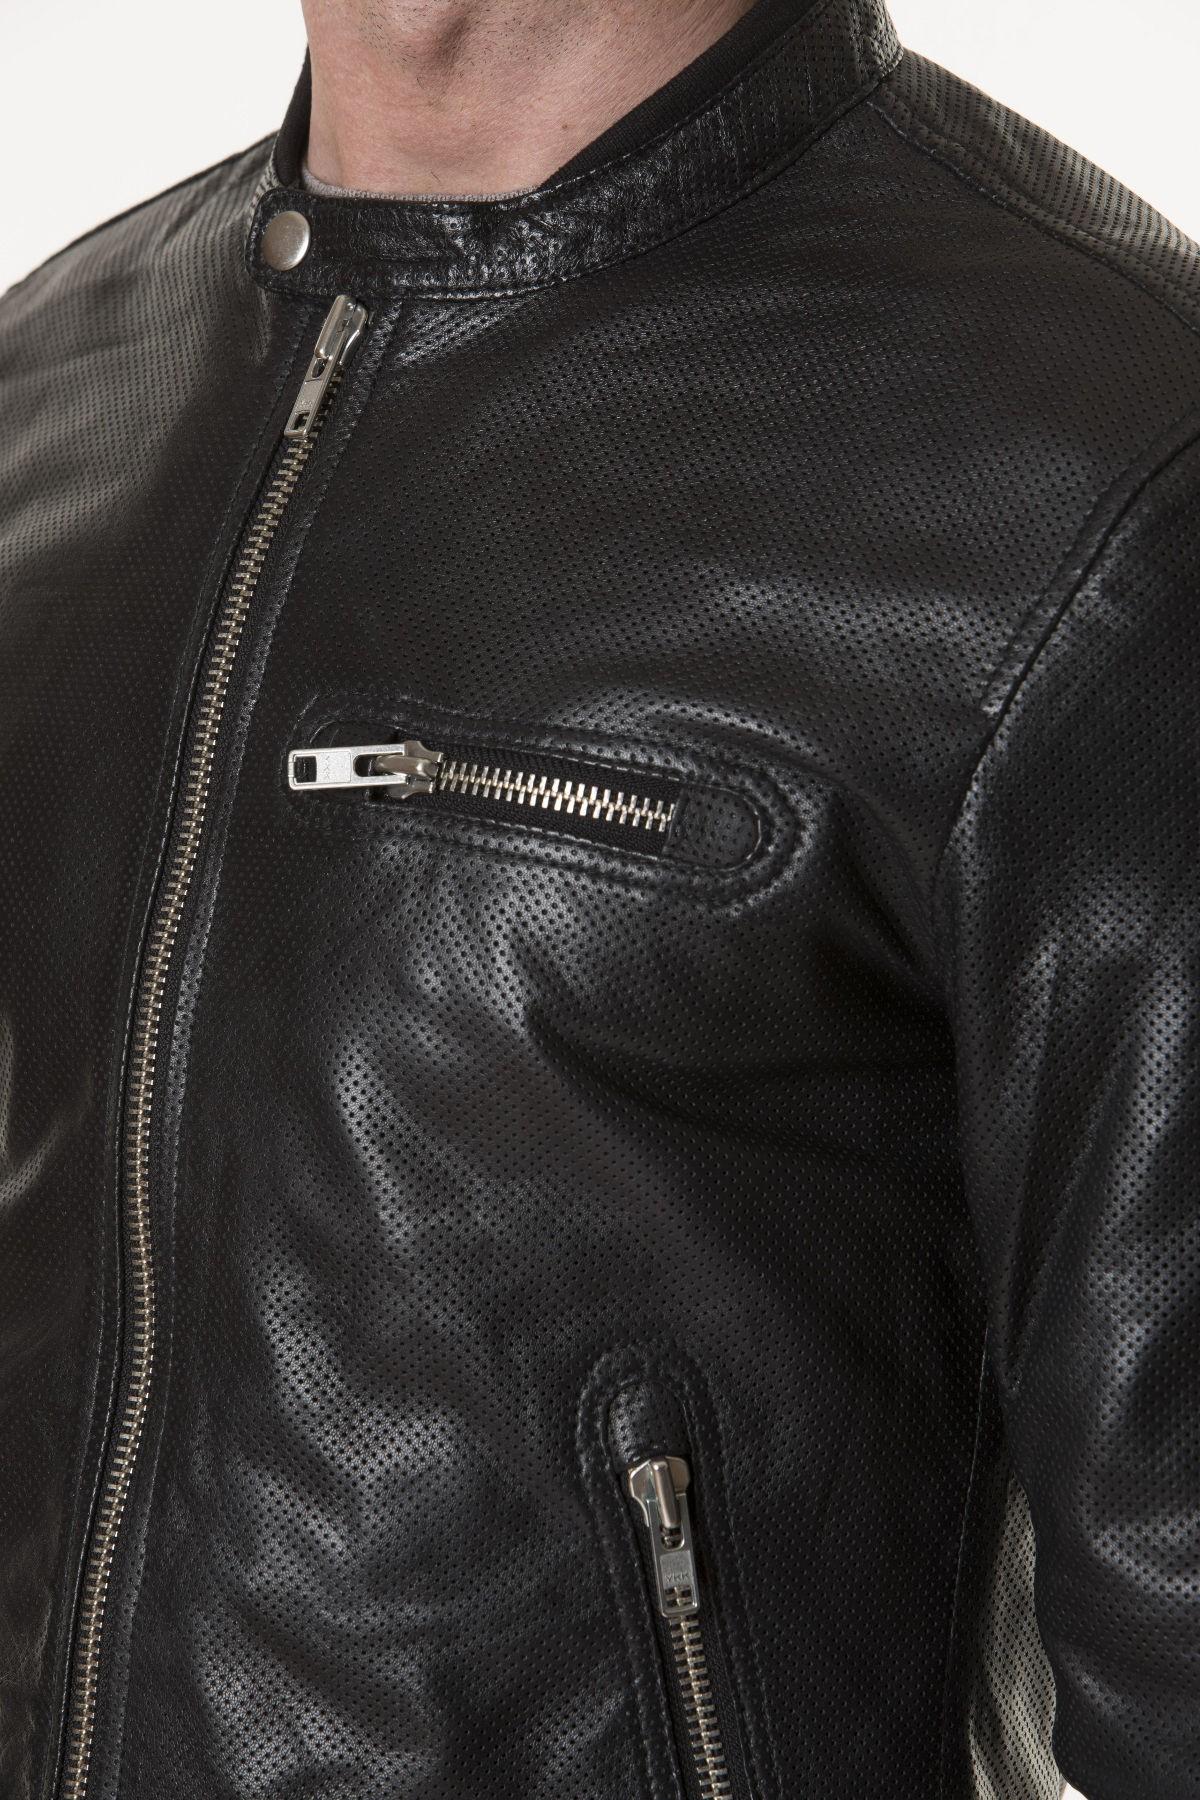 18 Man Jacket Ss Rione Bully Fontana For wT1xqv1O